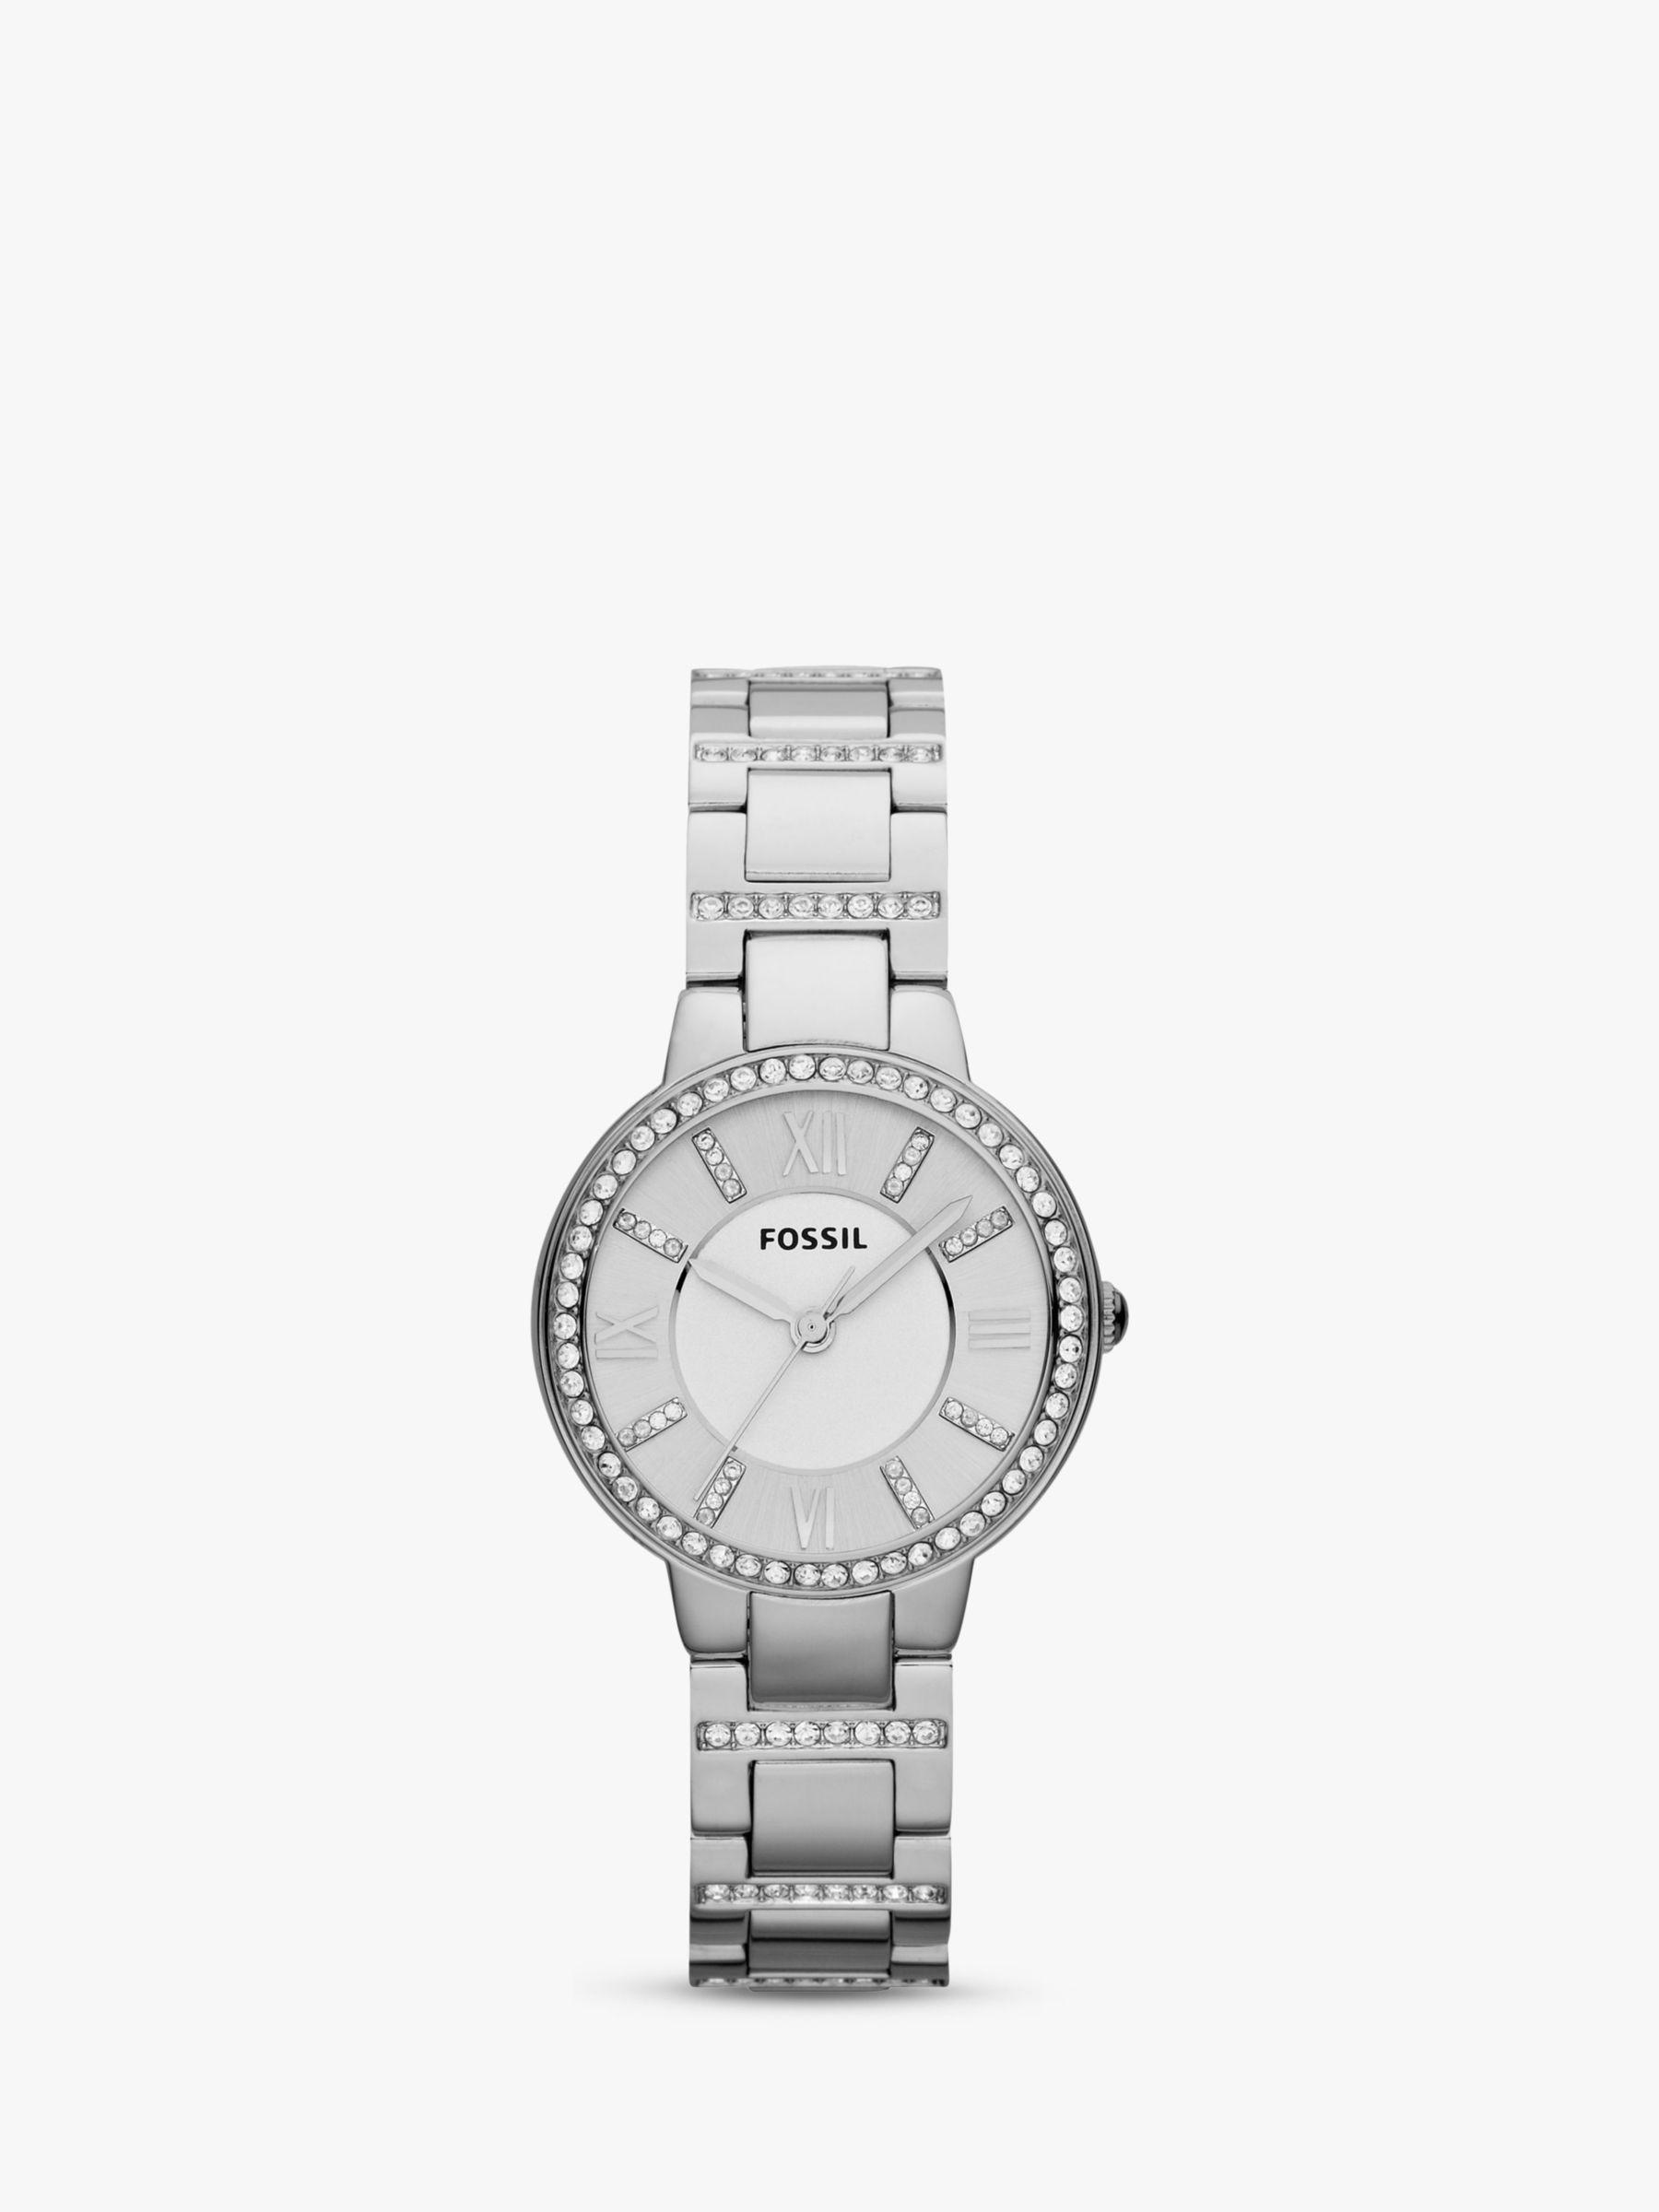 Fossil Fossil ES3282 Women's Virginia Stainless Steel Bracelet Strap Watch, Silver